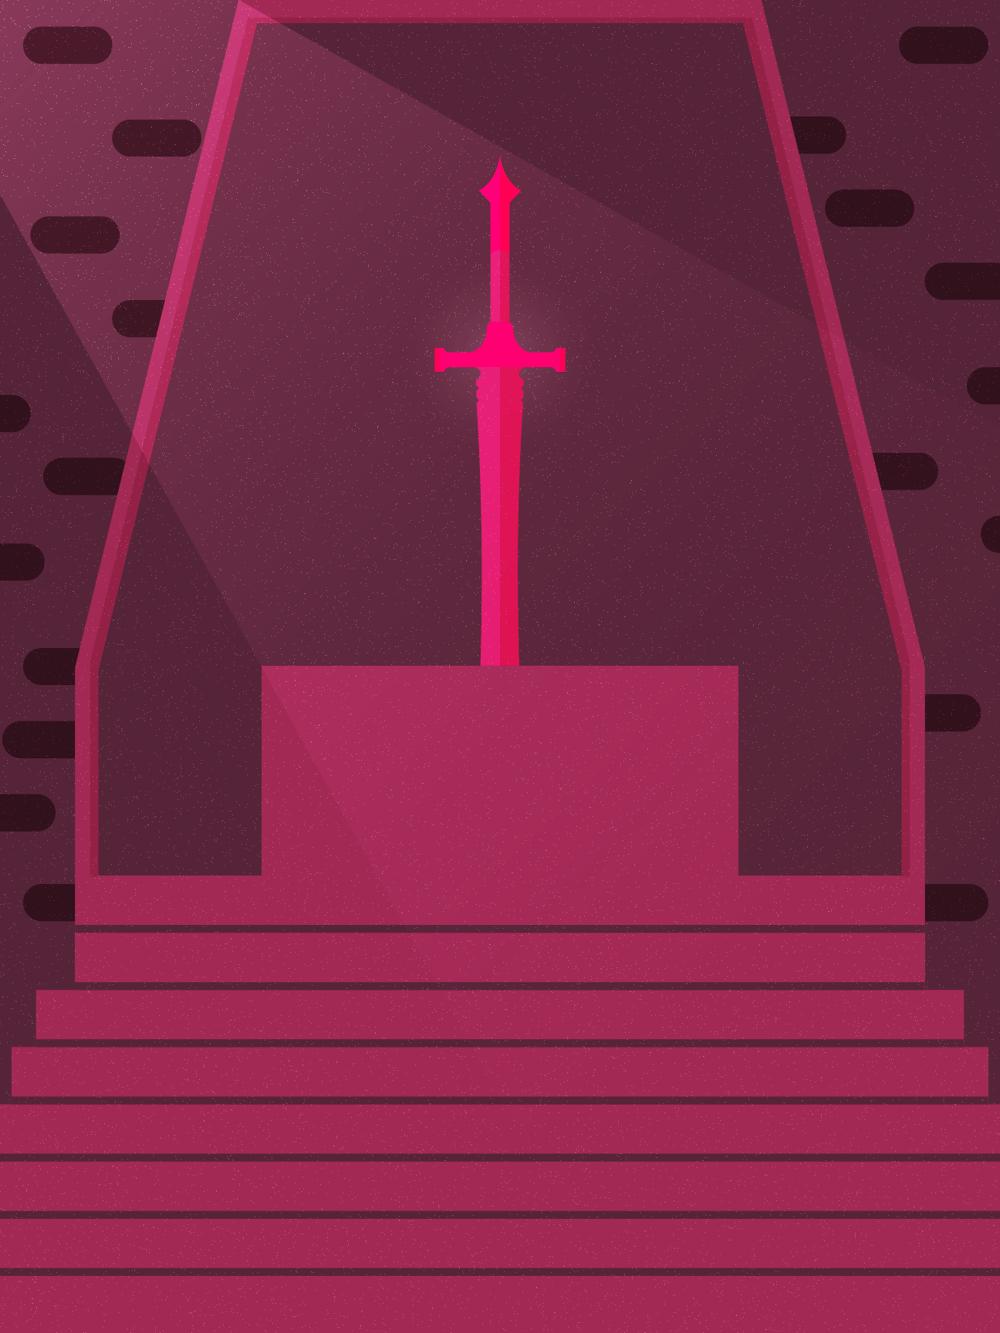 Sword Shrine - image 2 - student project